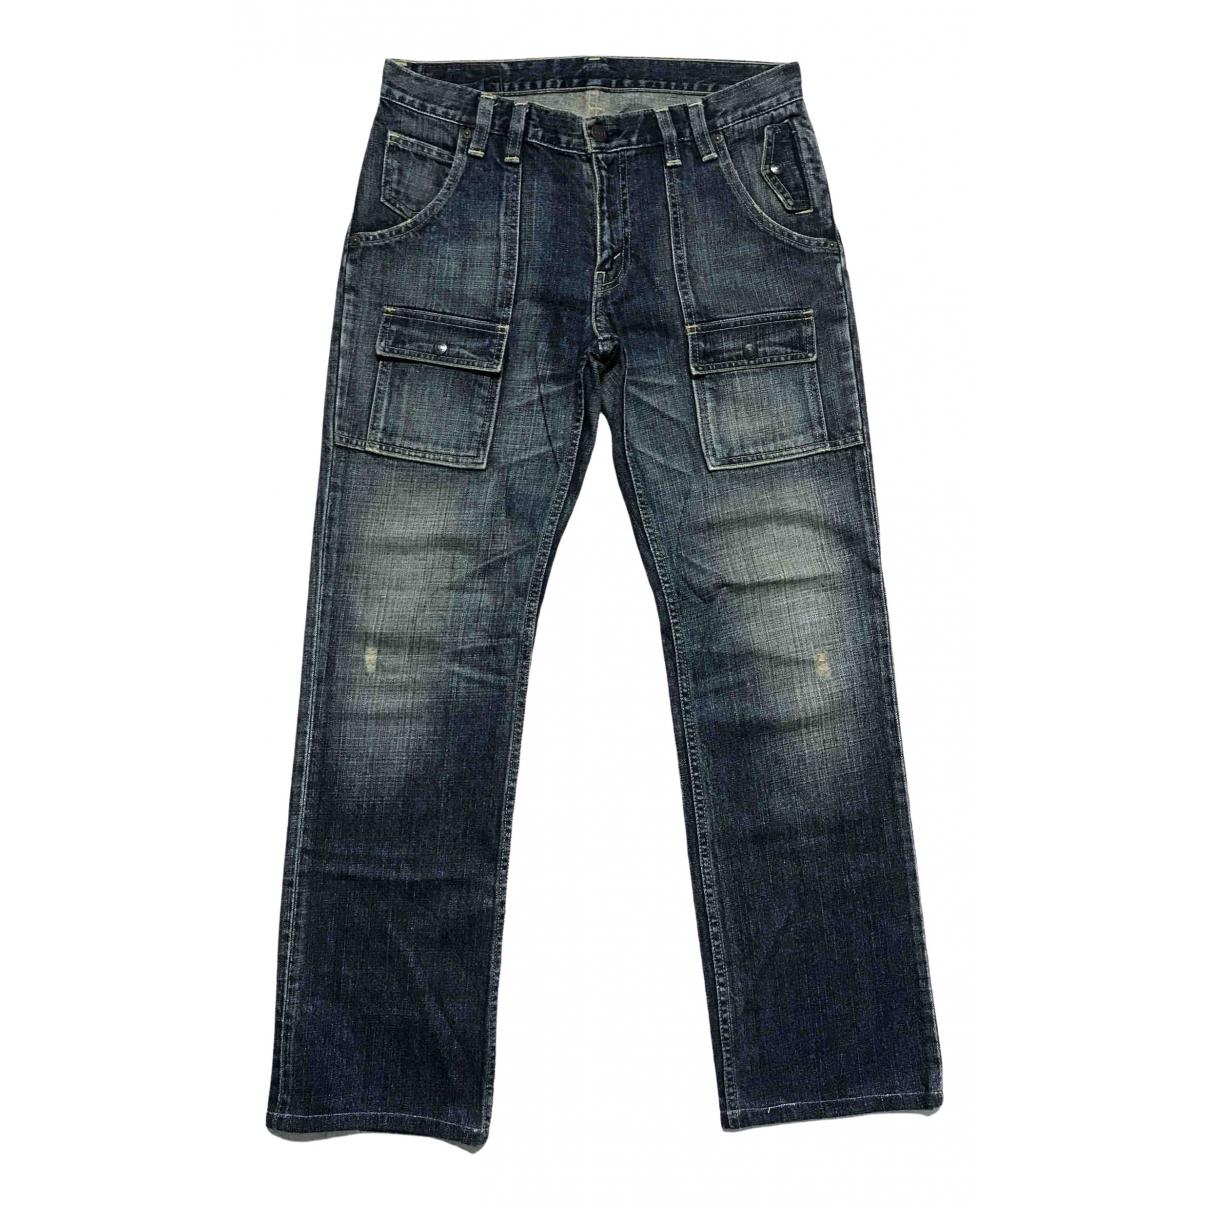 Levi's Vintage Clothing \N Cotton - elasthane Jeans for Men 32 US